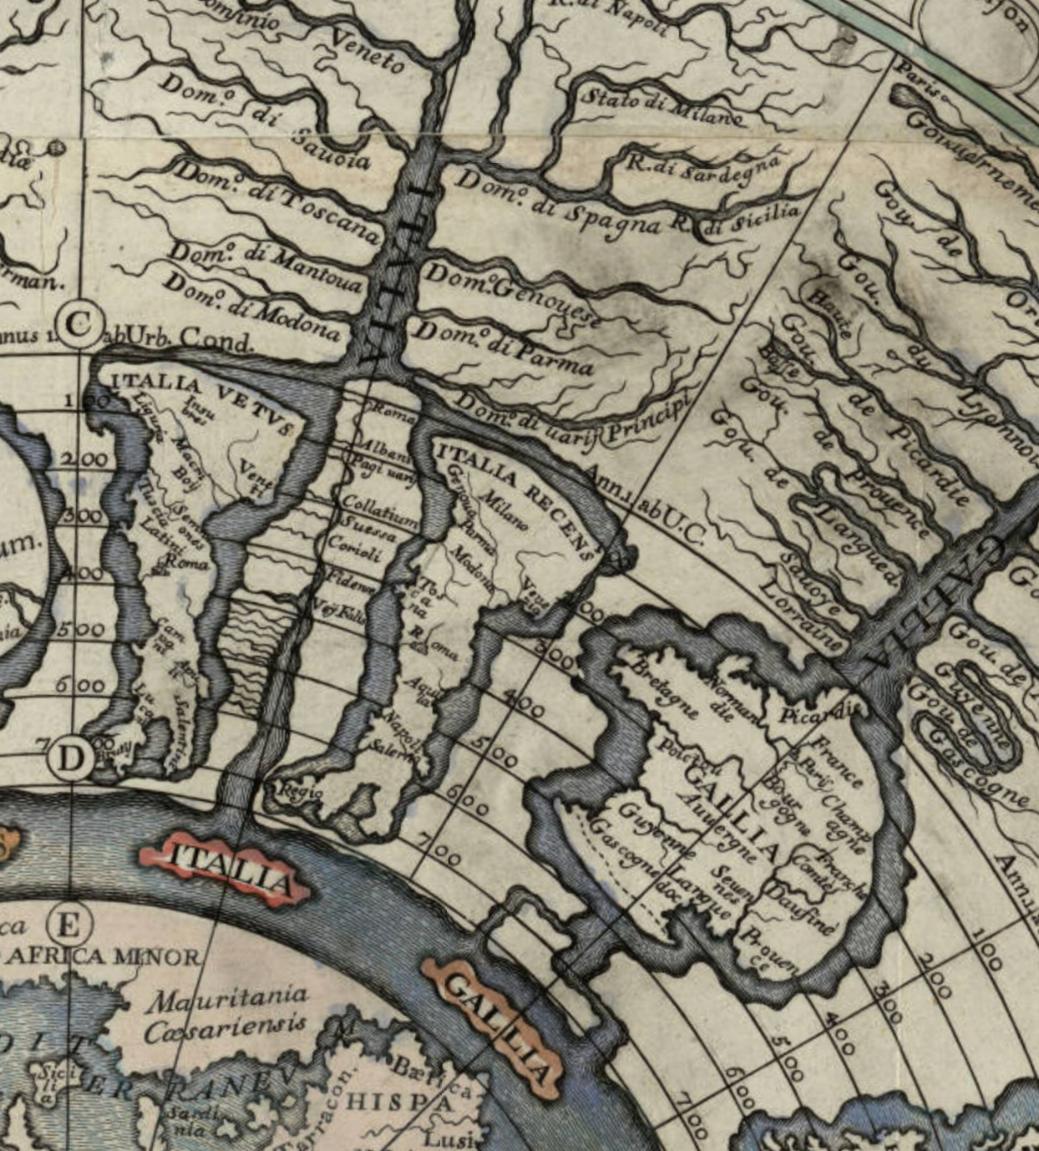 Detail from Girolamo Andrea Martignoni's 1718 chronographic map of the history of the Roman empire,  Imago Romani imperii .